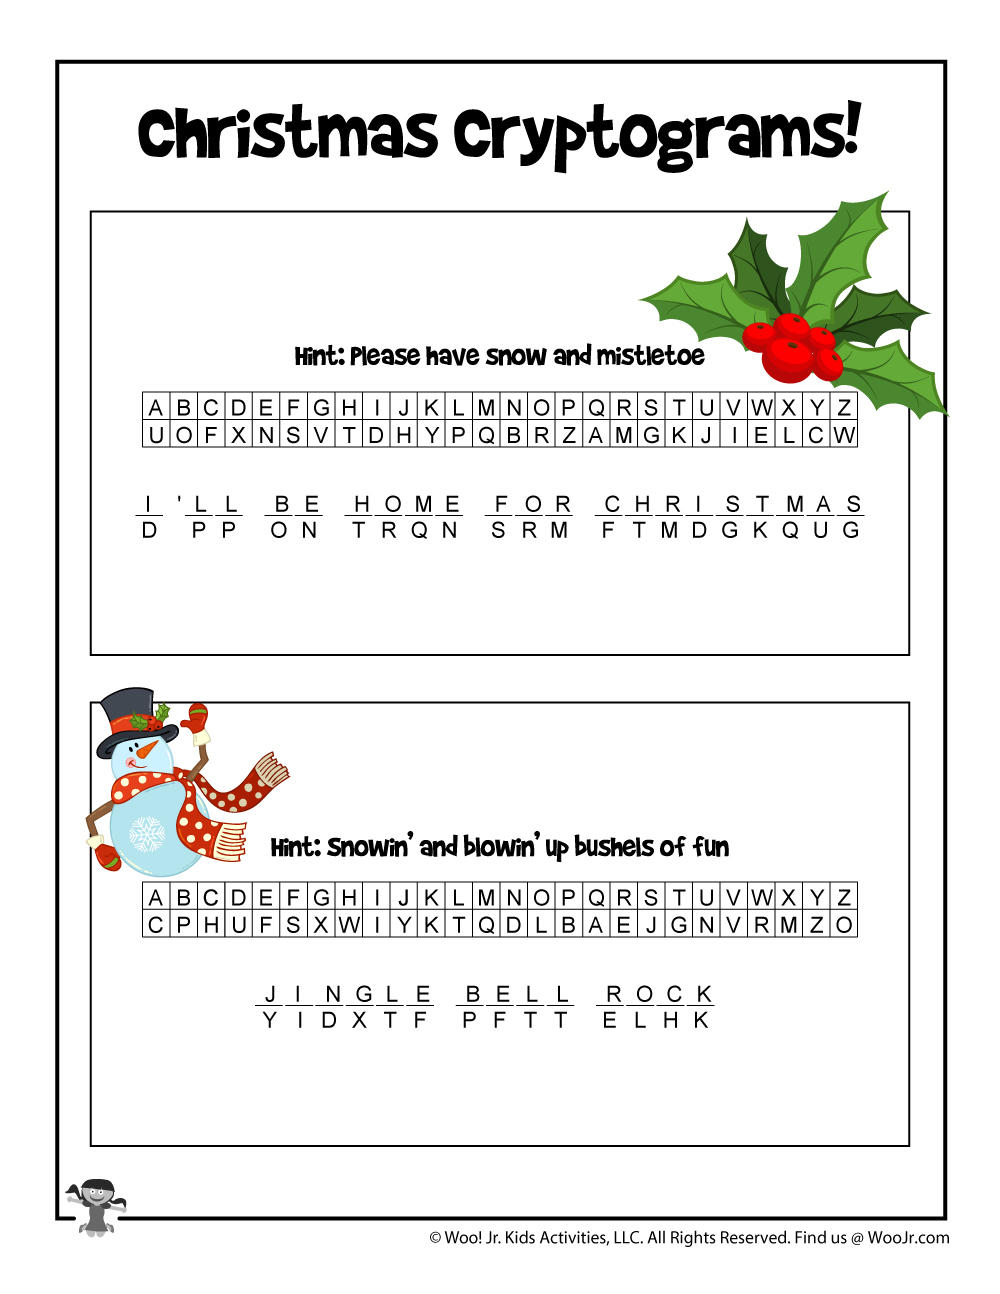 Christmas Carols Printable Puzzle Game - Answer Key | Woo